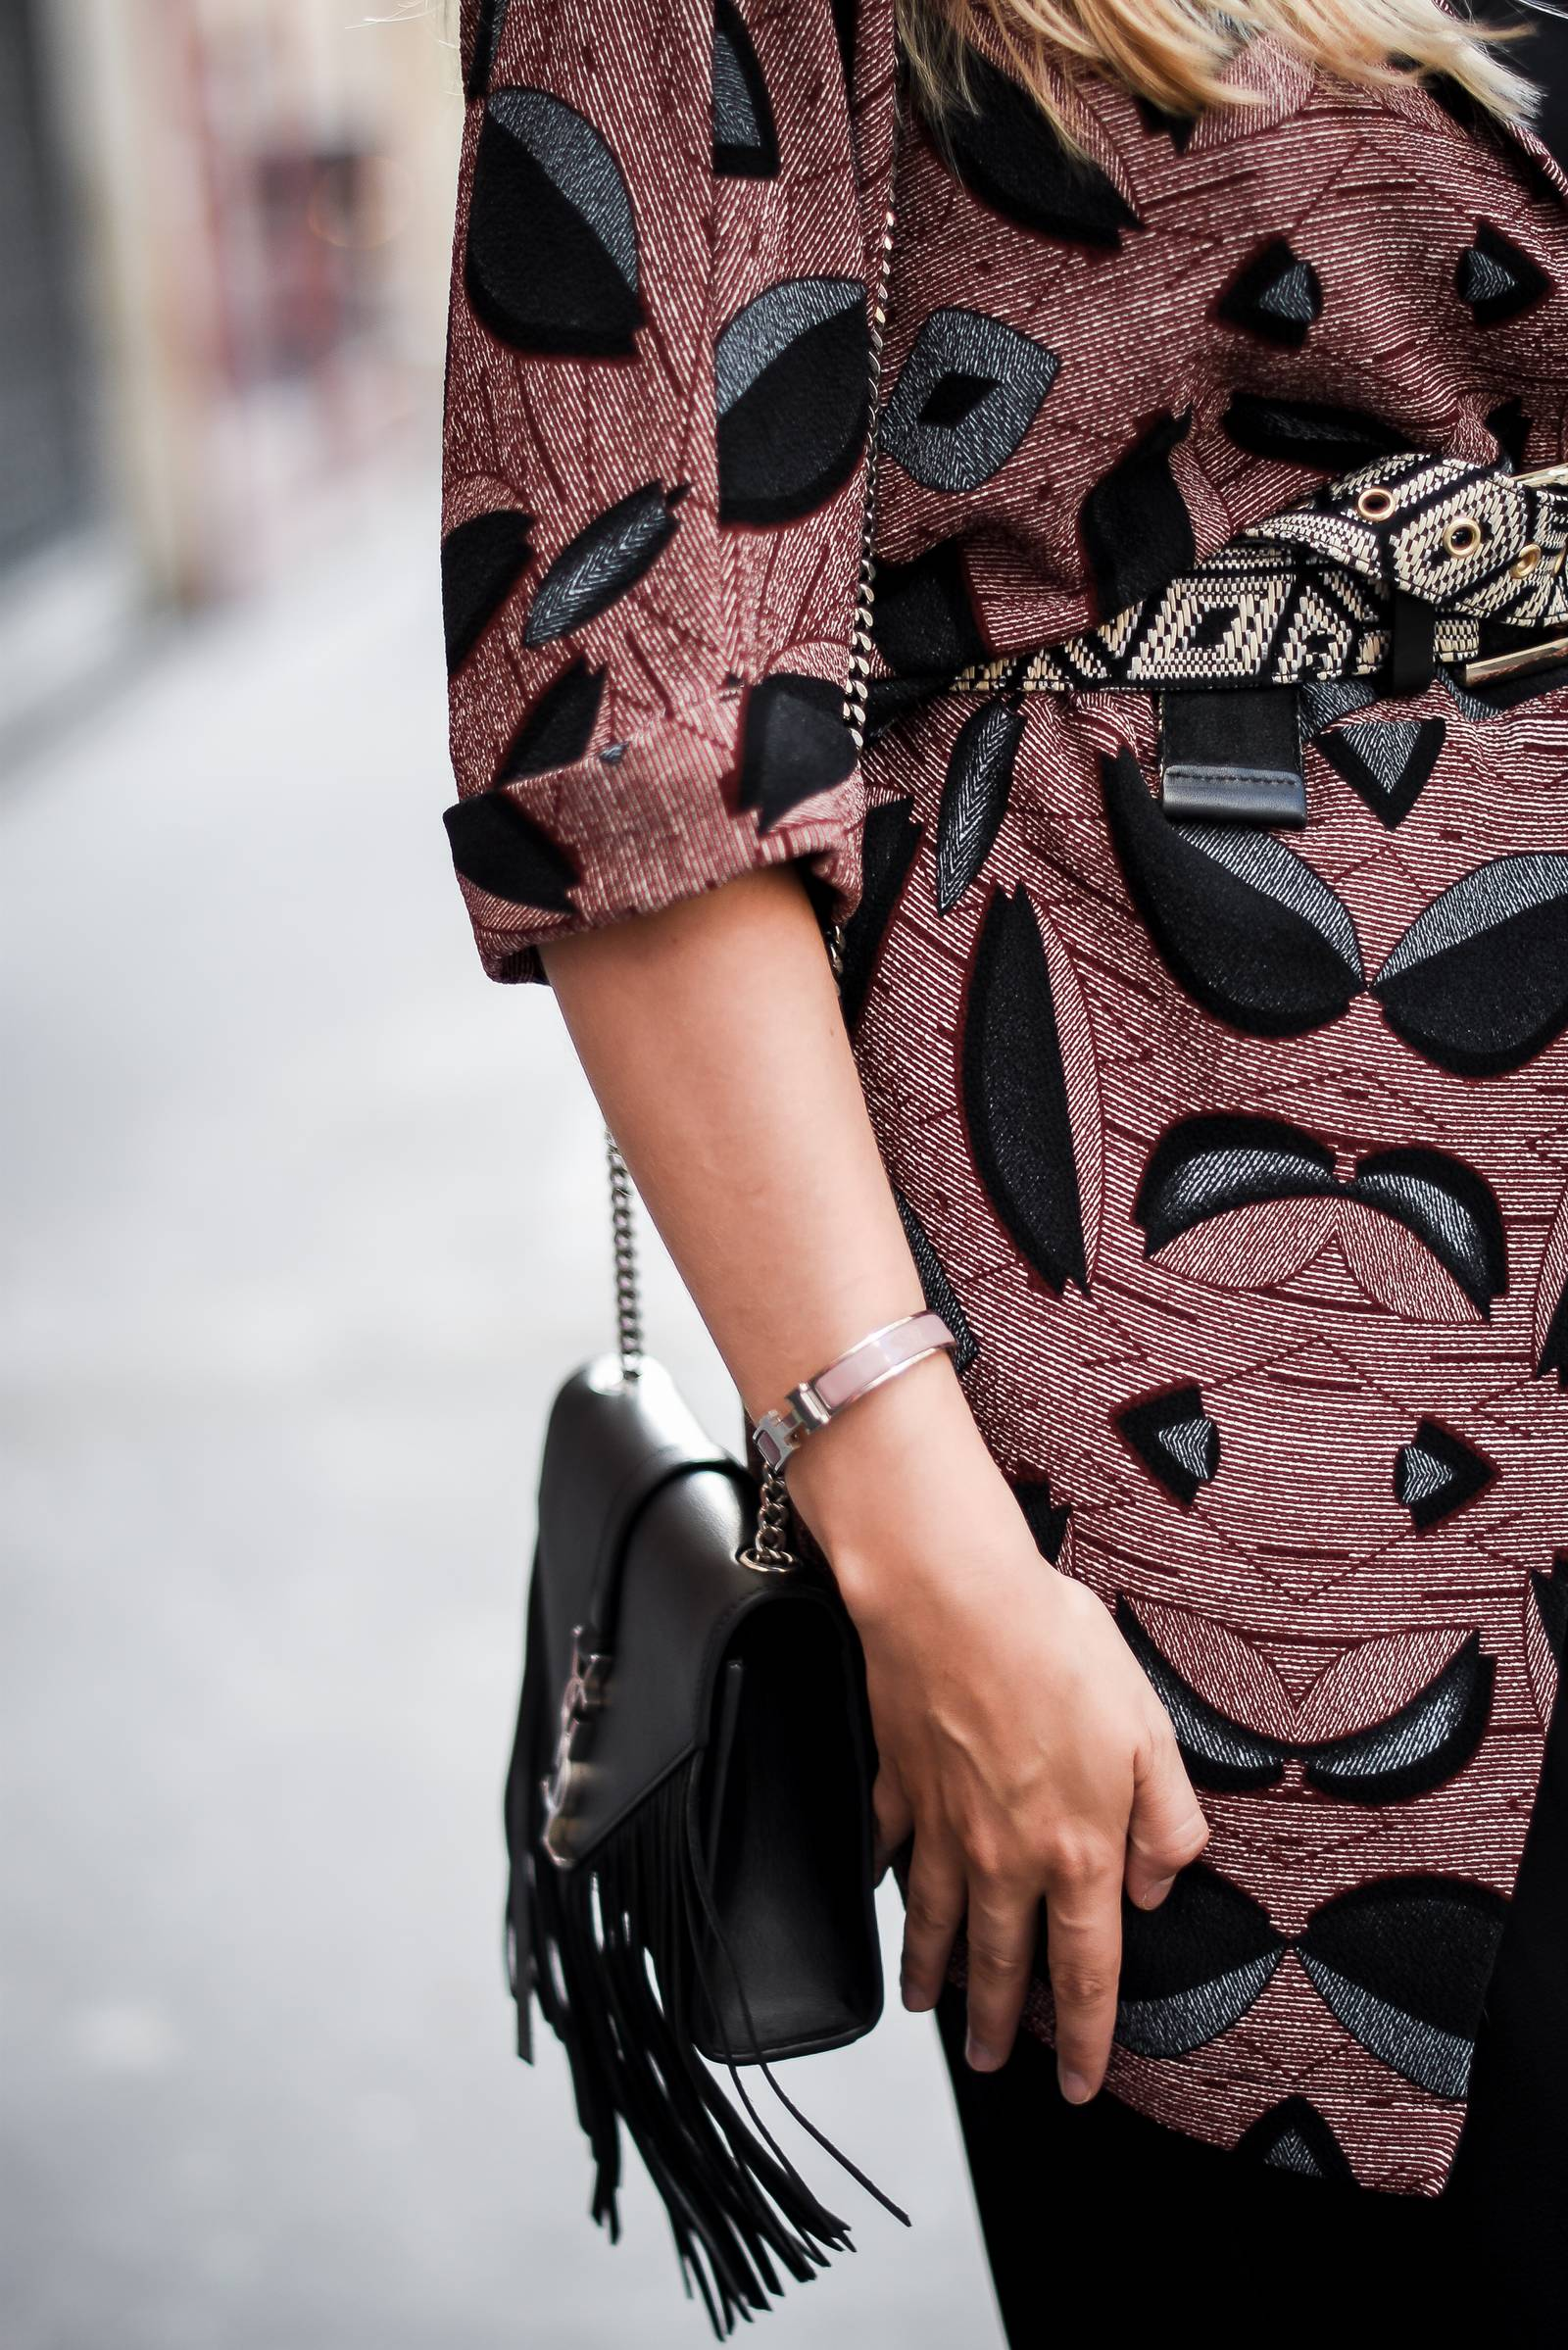 blog mode - Comment s'habiller pour aller au restaurant 8